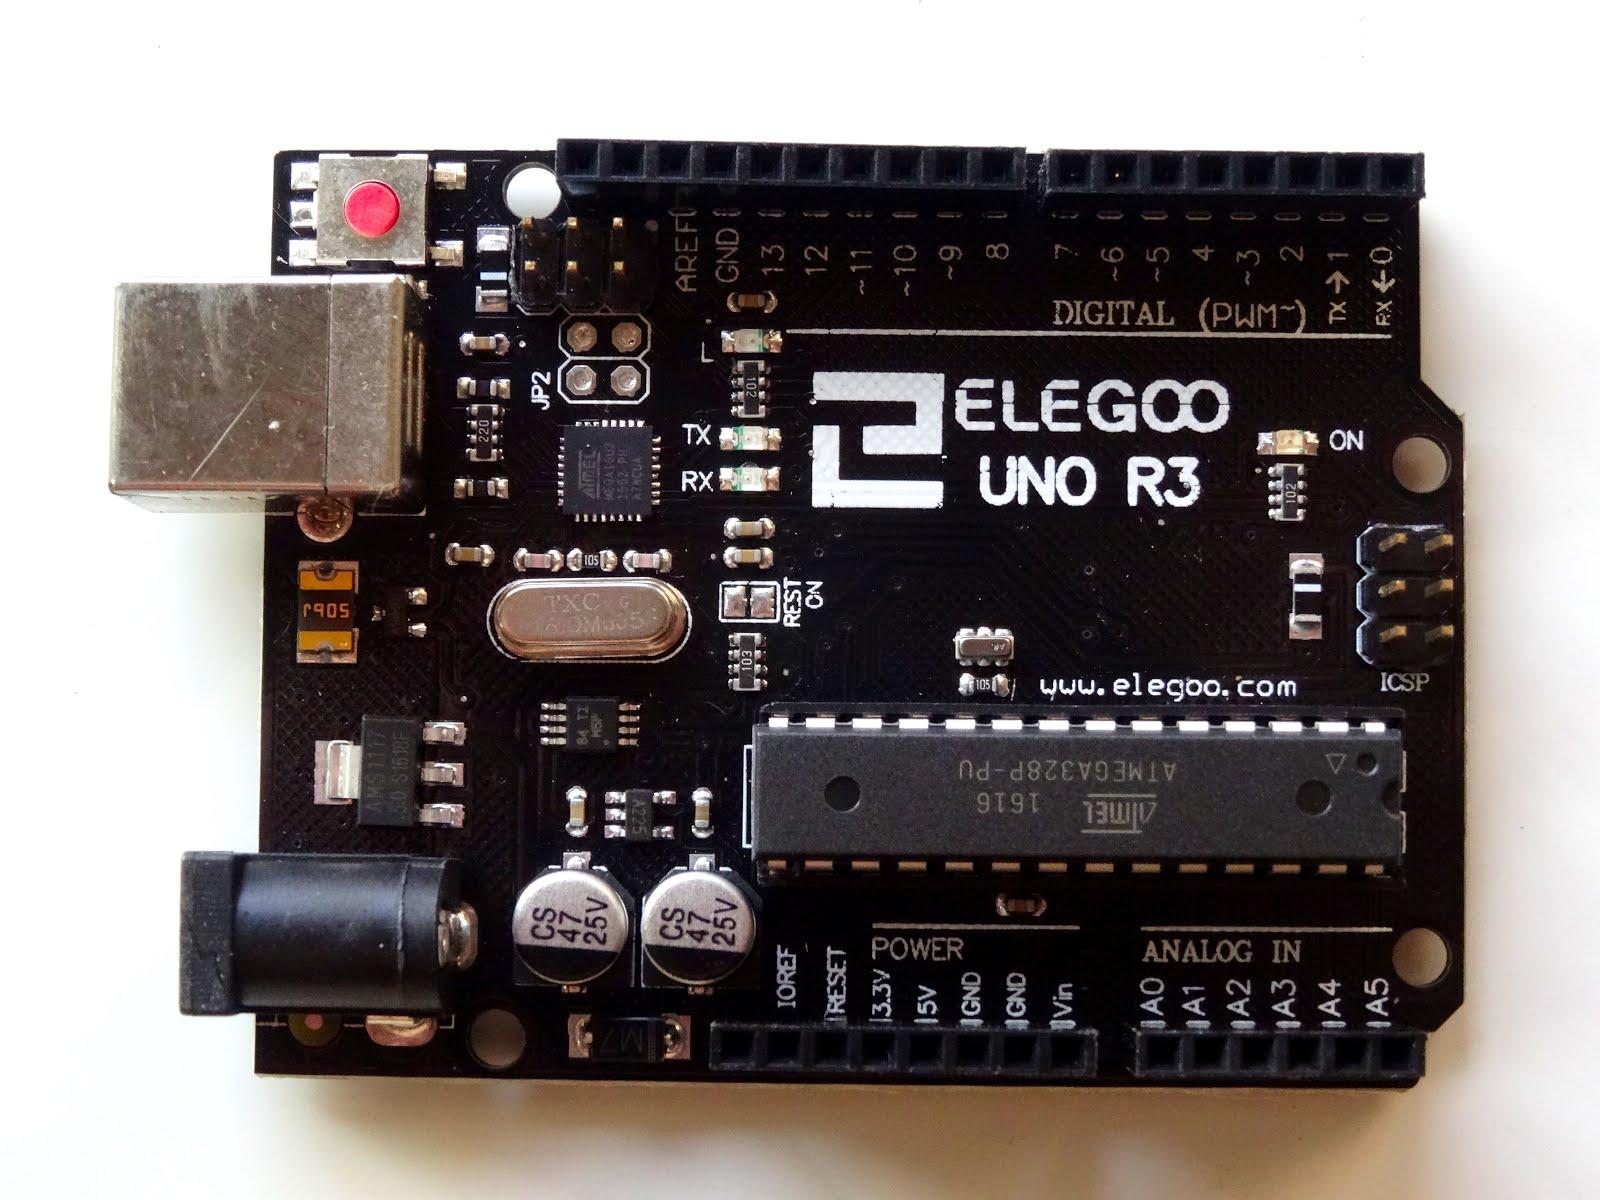 Mitov software assembling elegoo smart robot car kit step